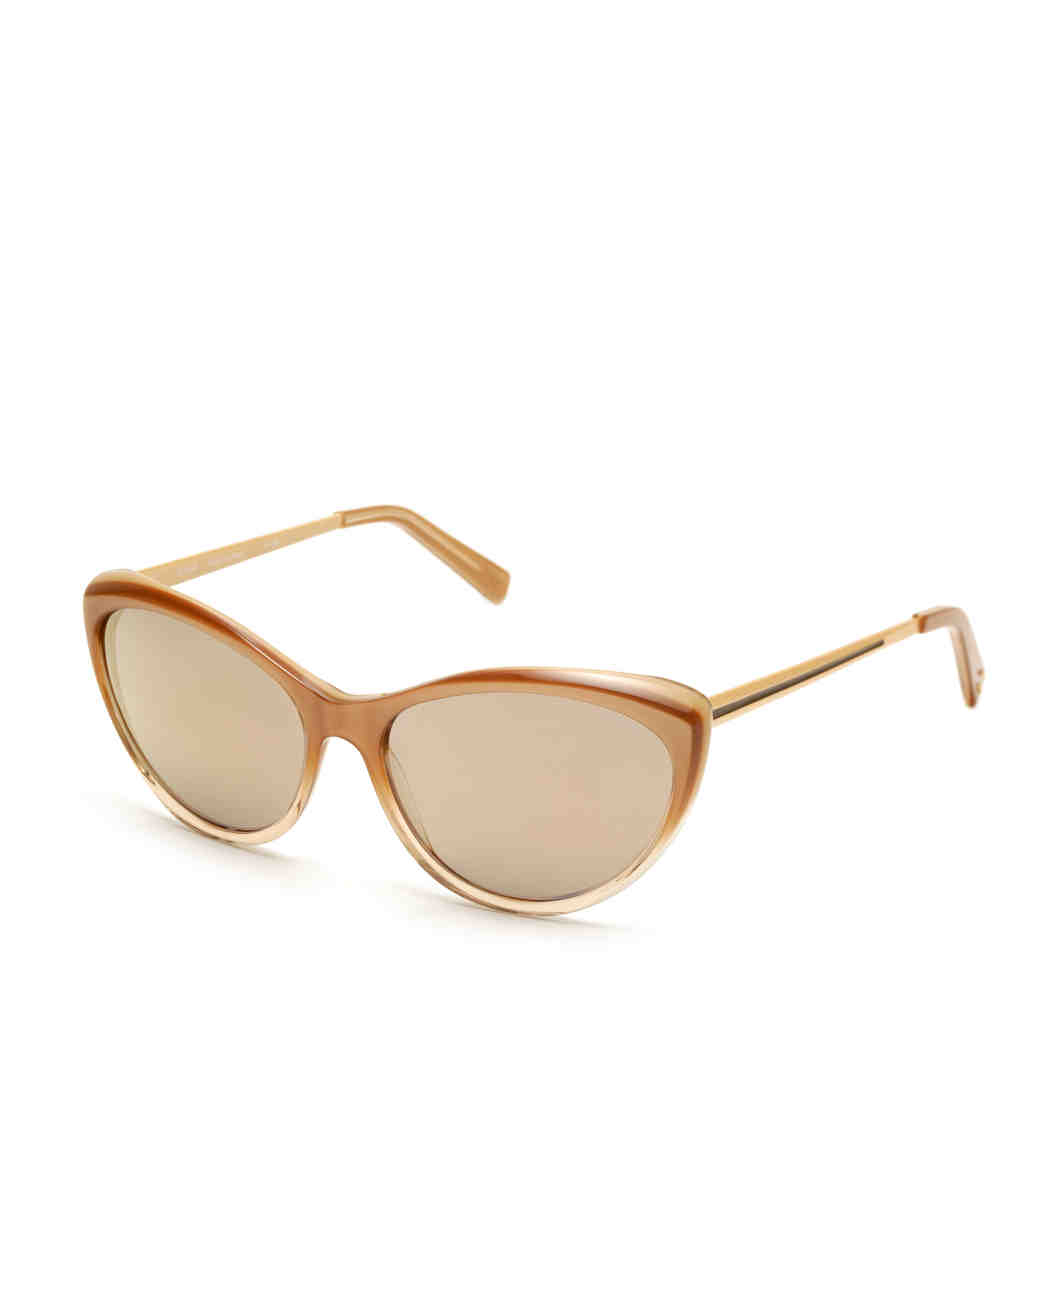 mother-bride-groom-gift-shaun-sunglasses-0415.jpg